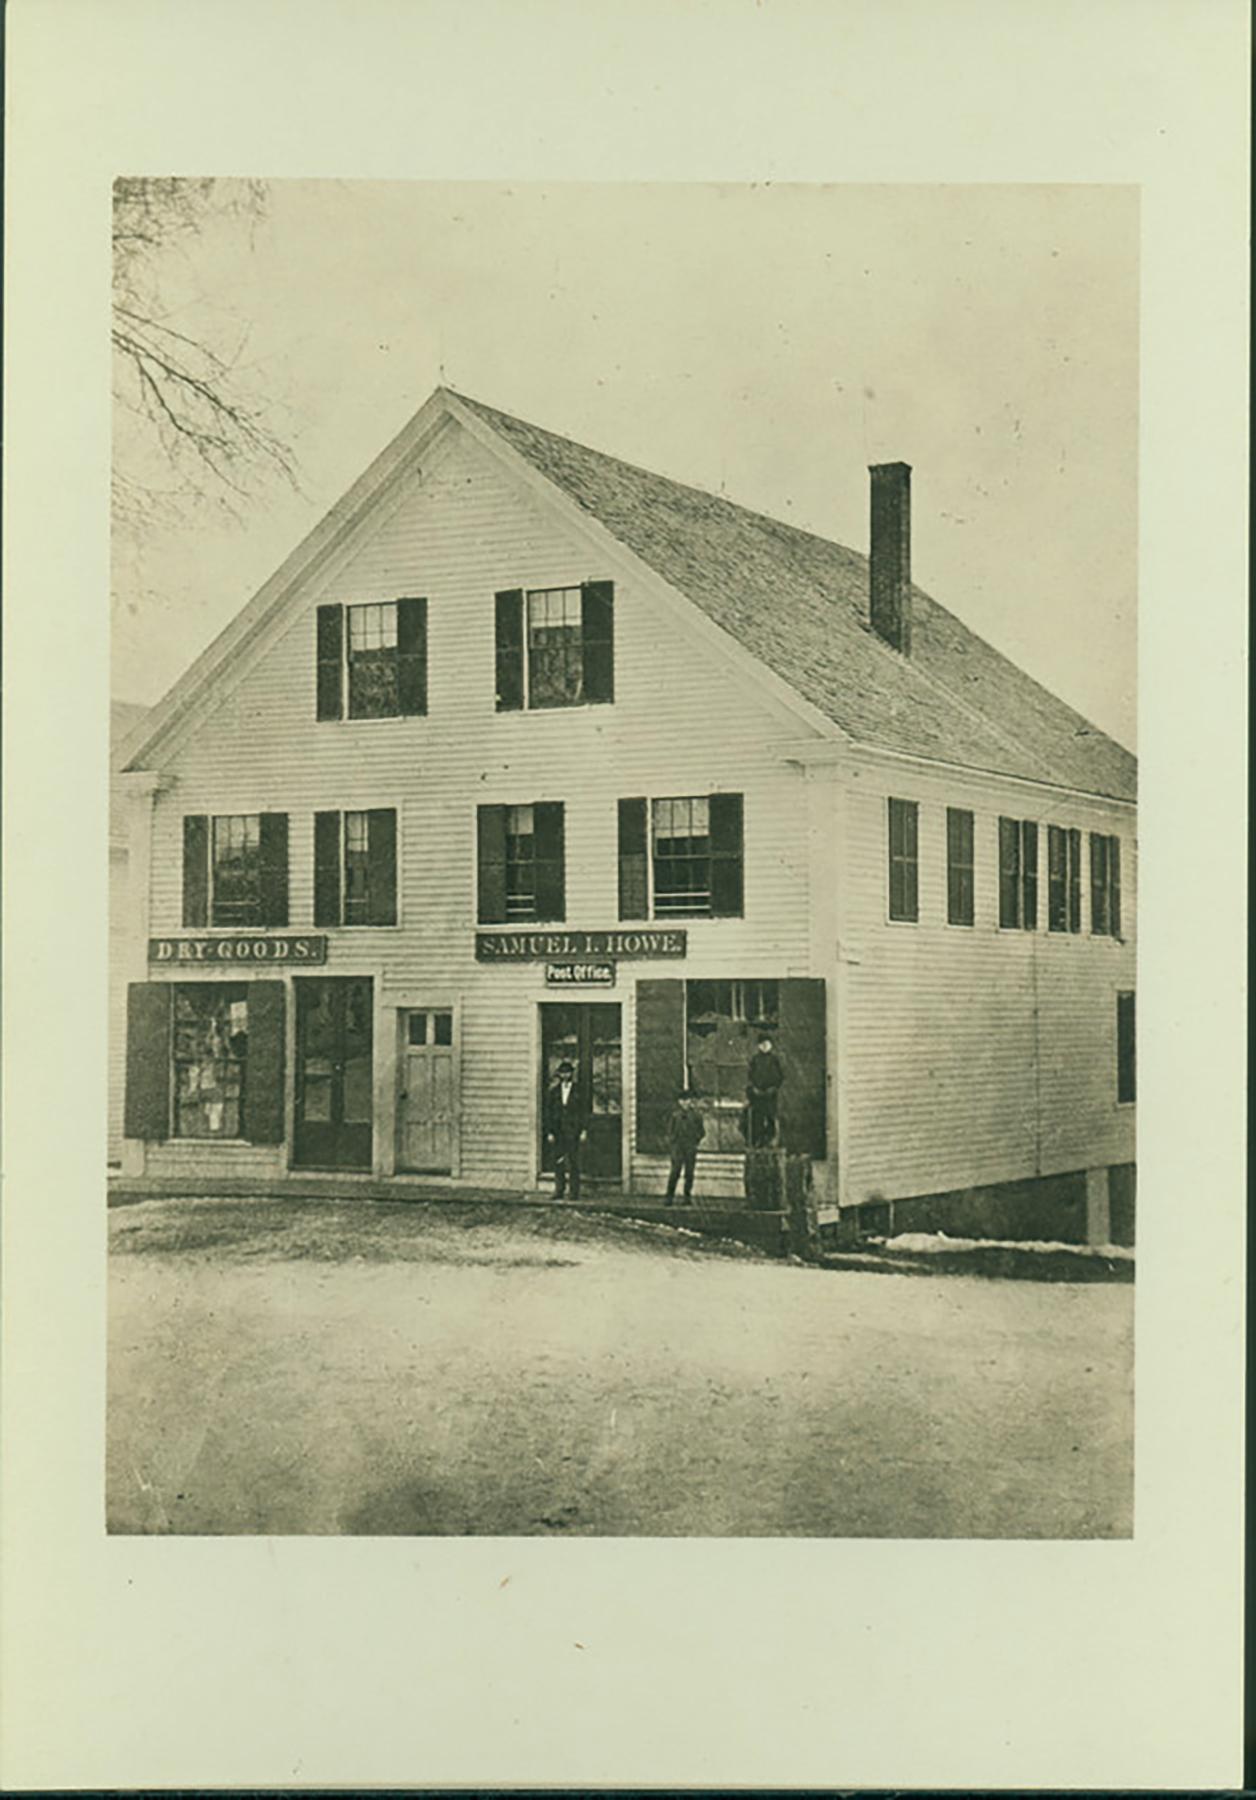 Howe's store in Shrewsbury showing post office